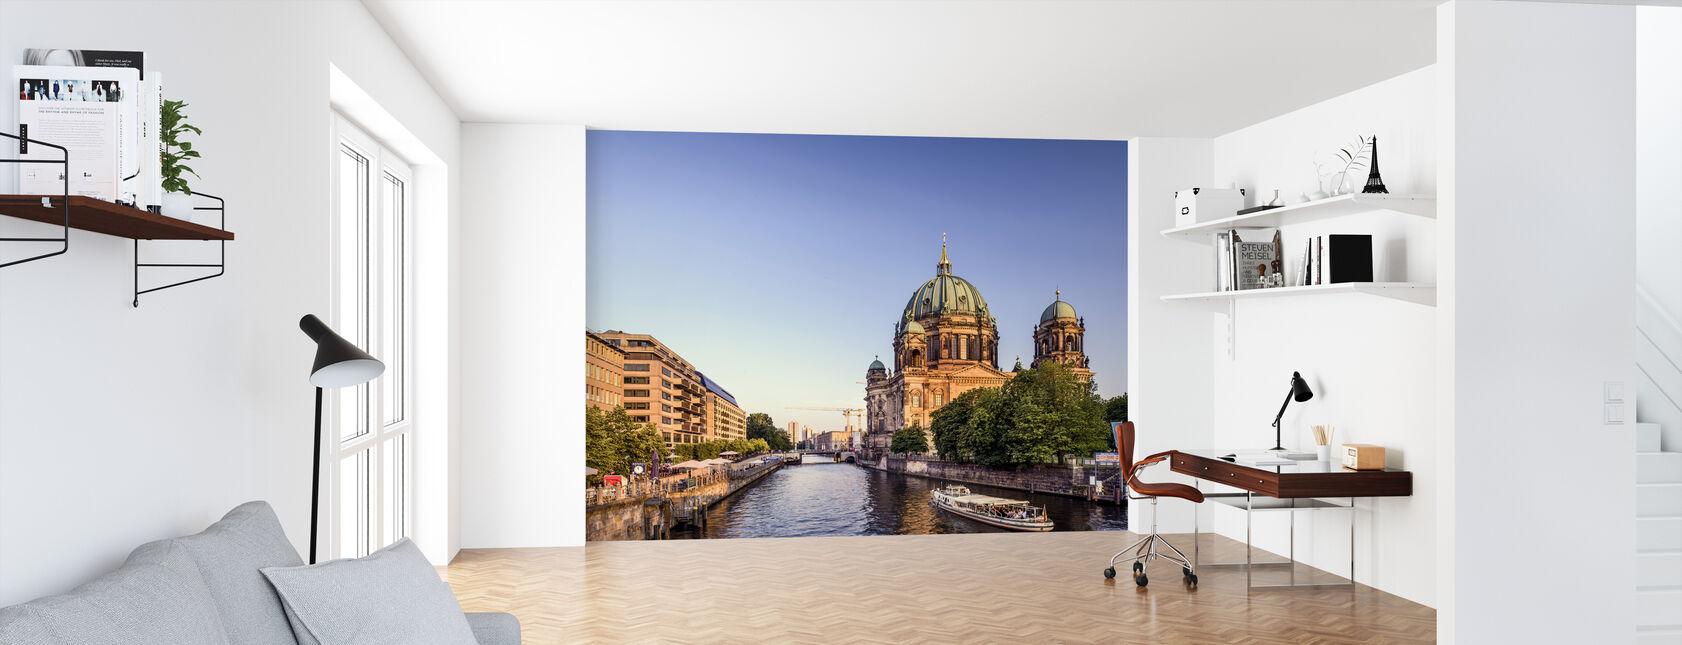 Berliner Dom - Wallpaper - Office